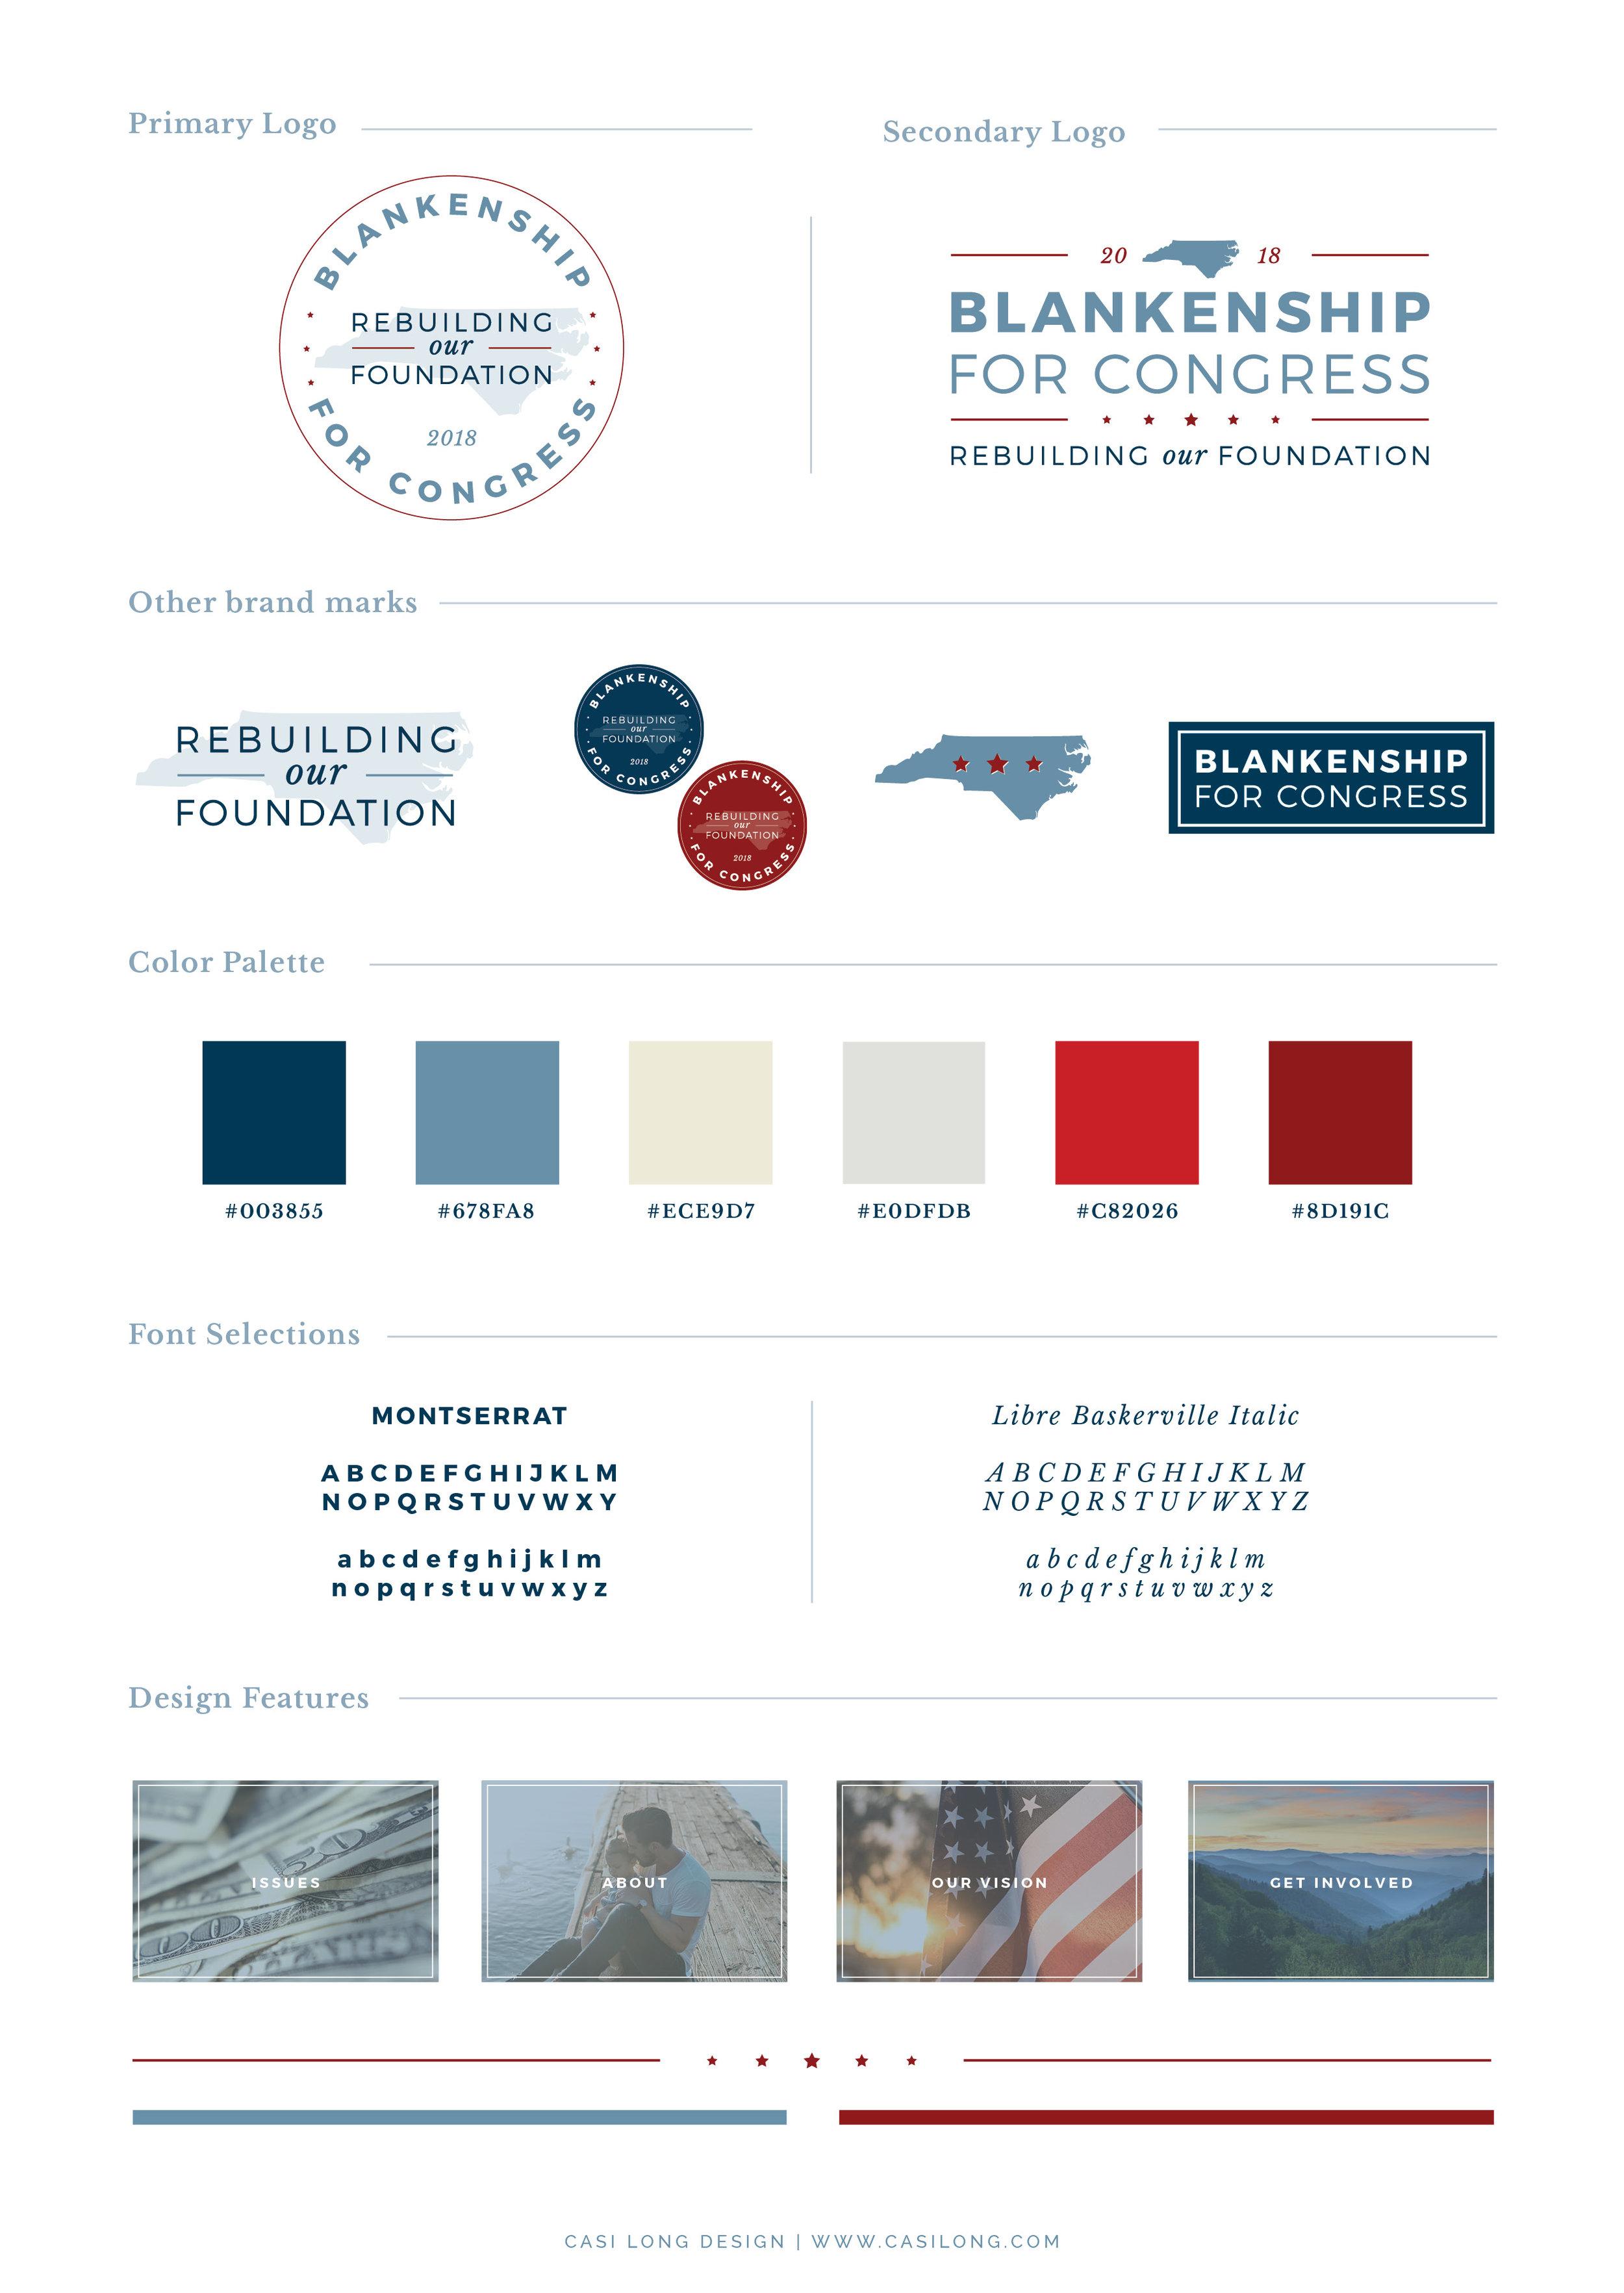 Style Guide | Blankenship for Congress | www.blankenshipforcongress.com